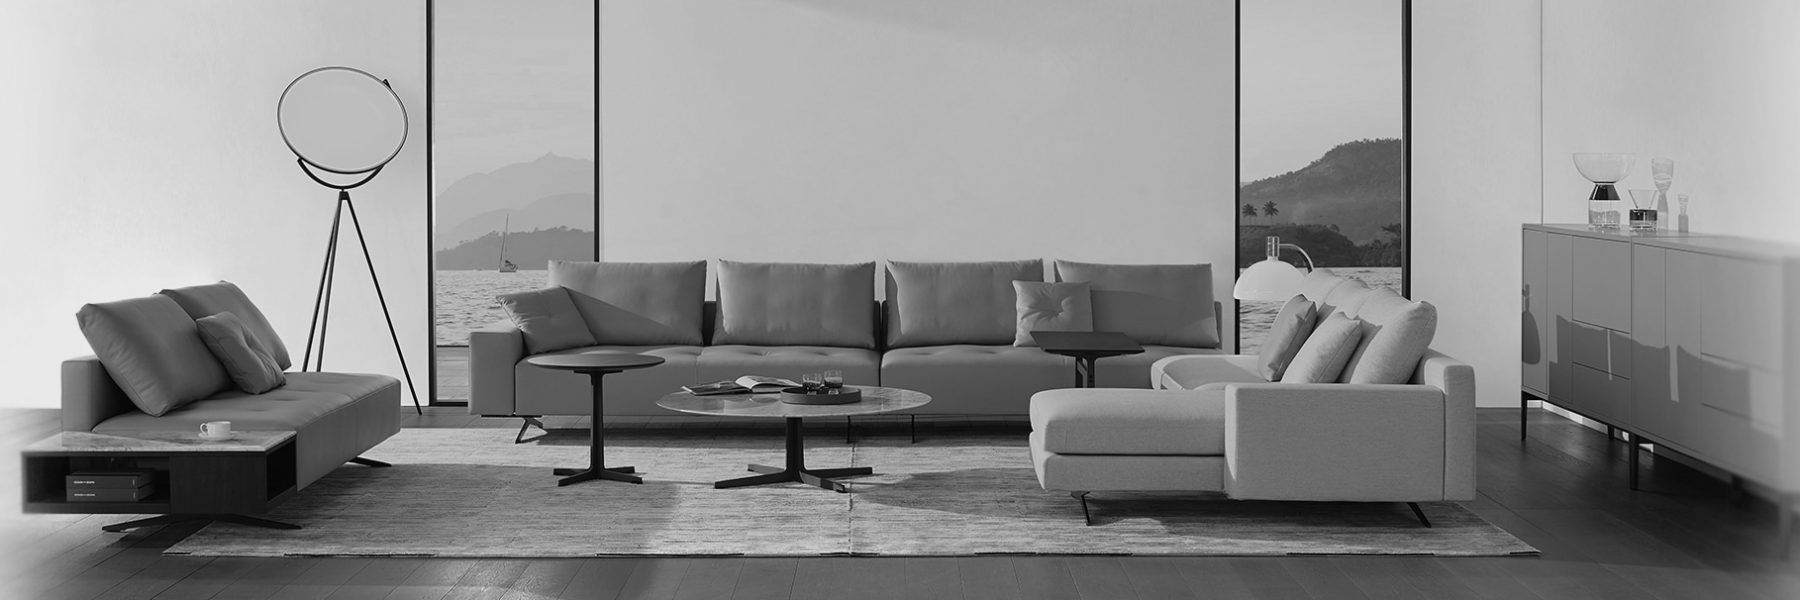 RM Living Cincinnati Modern Interior Design Custom Contemporary Furniture By Camerich